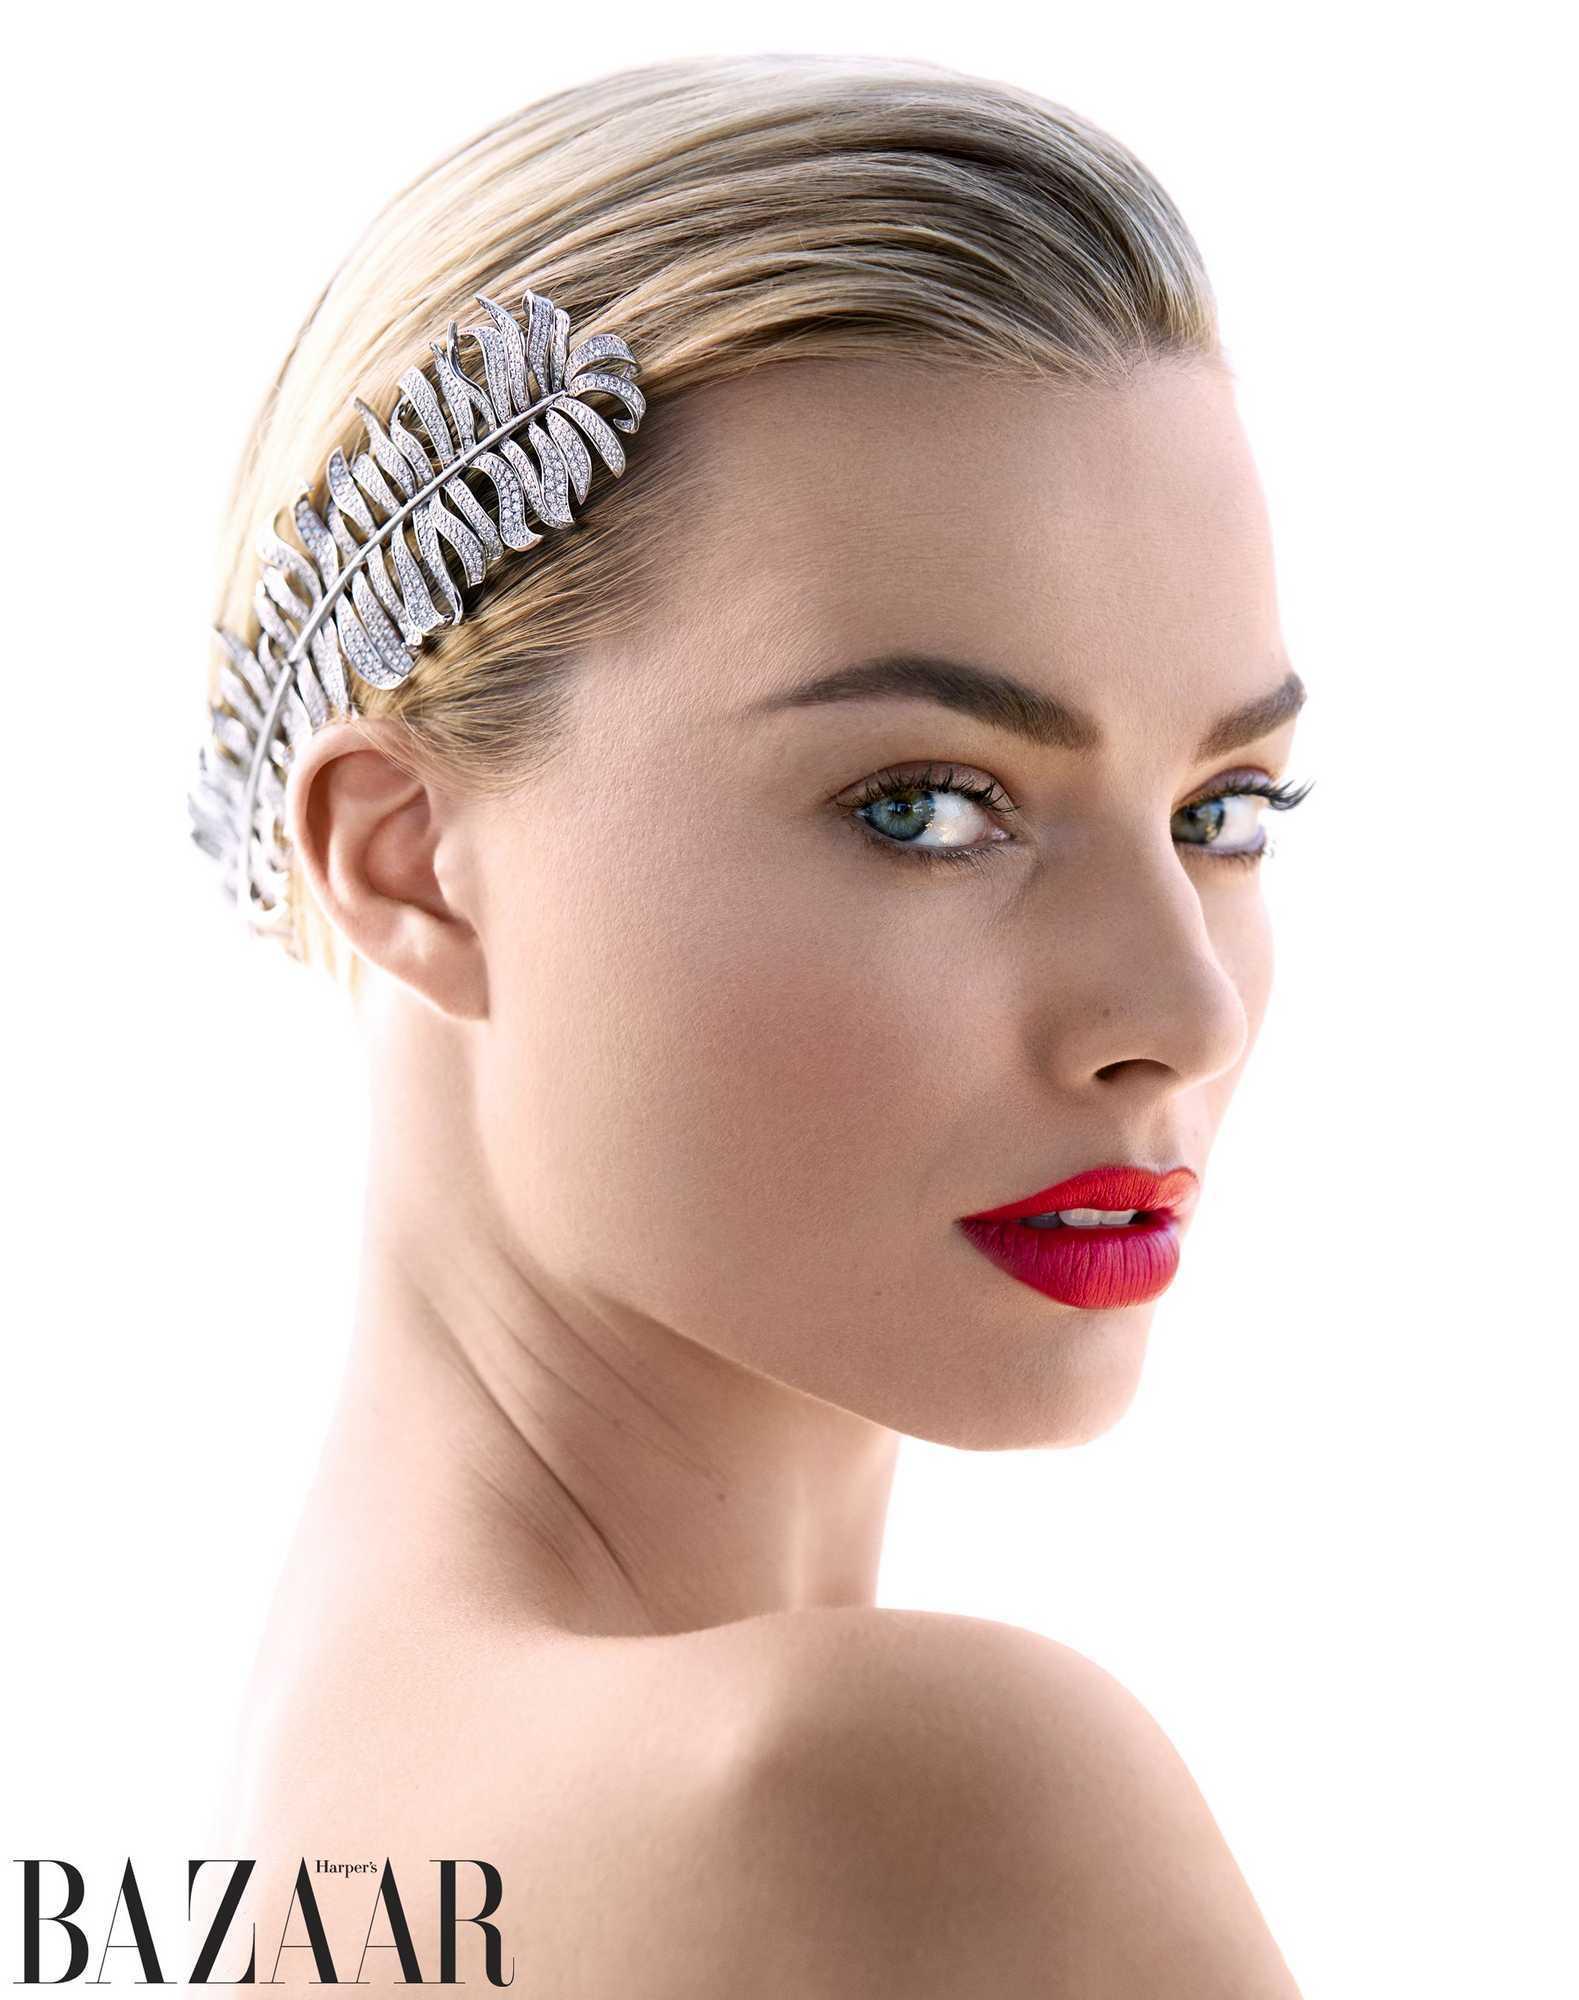 Margot-Robbie-Harpers-Bazaar-US-Magazine-December-2018January-20198.jpg